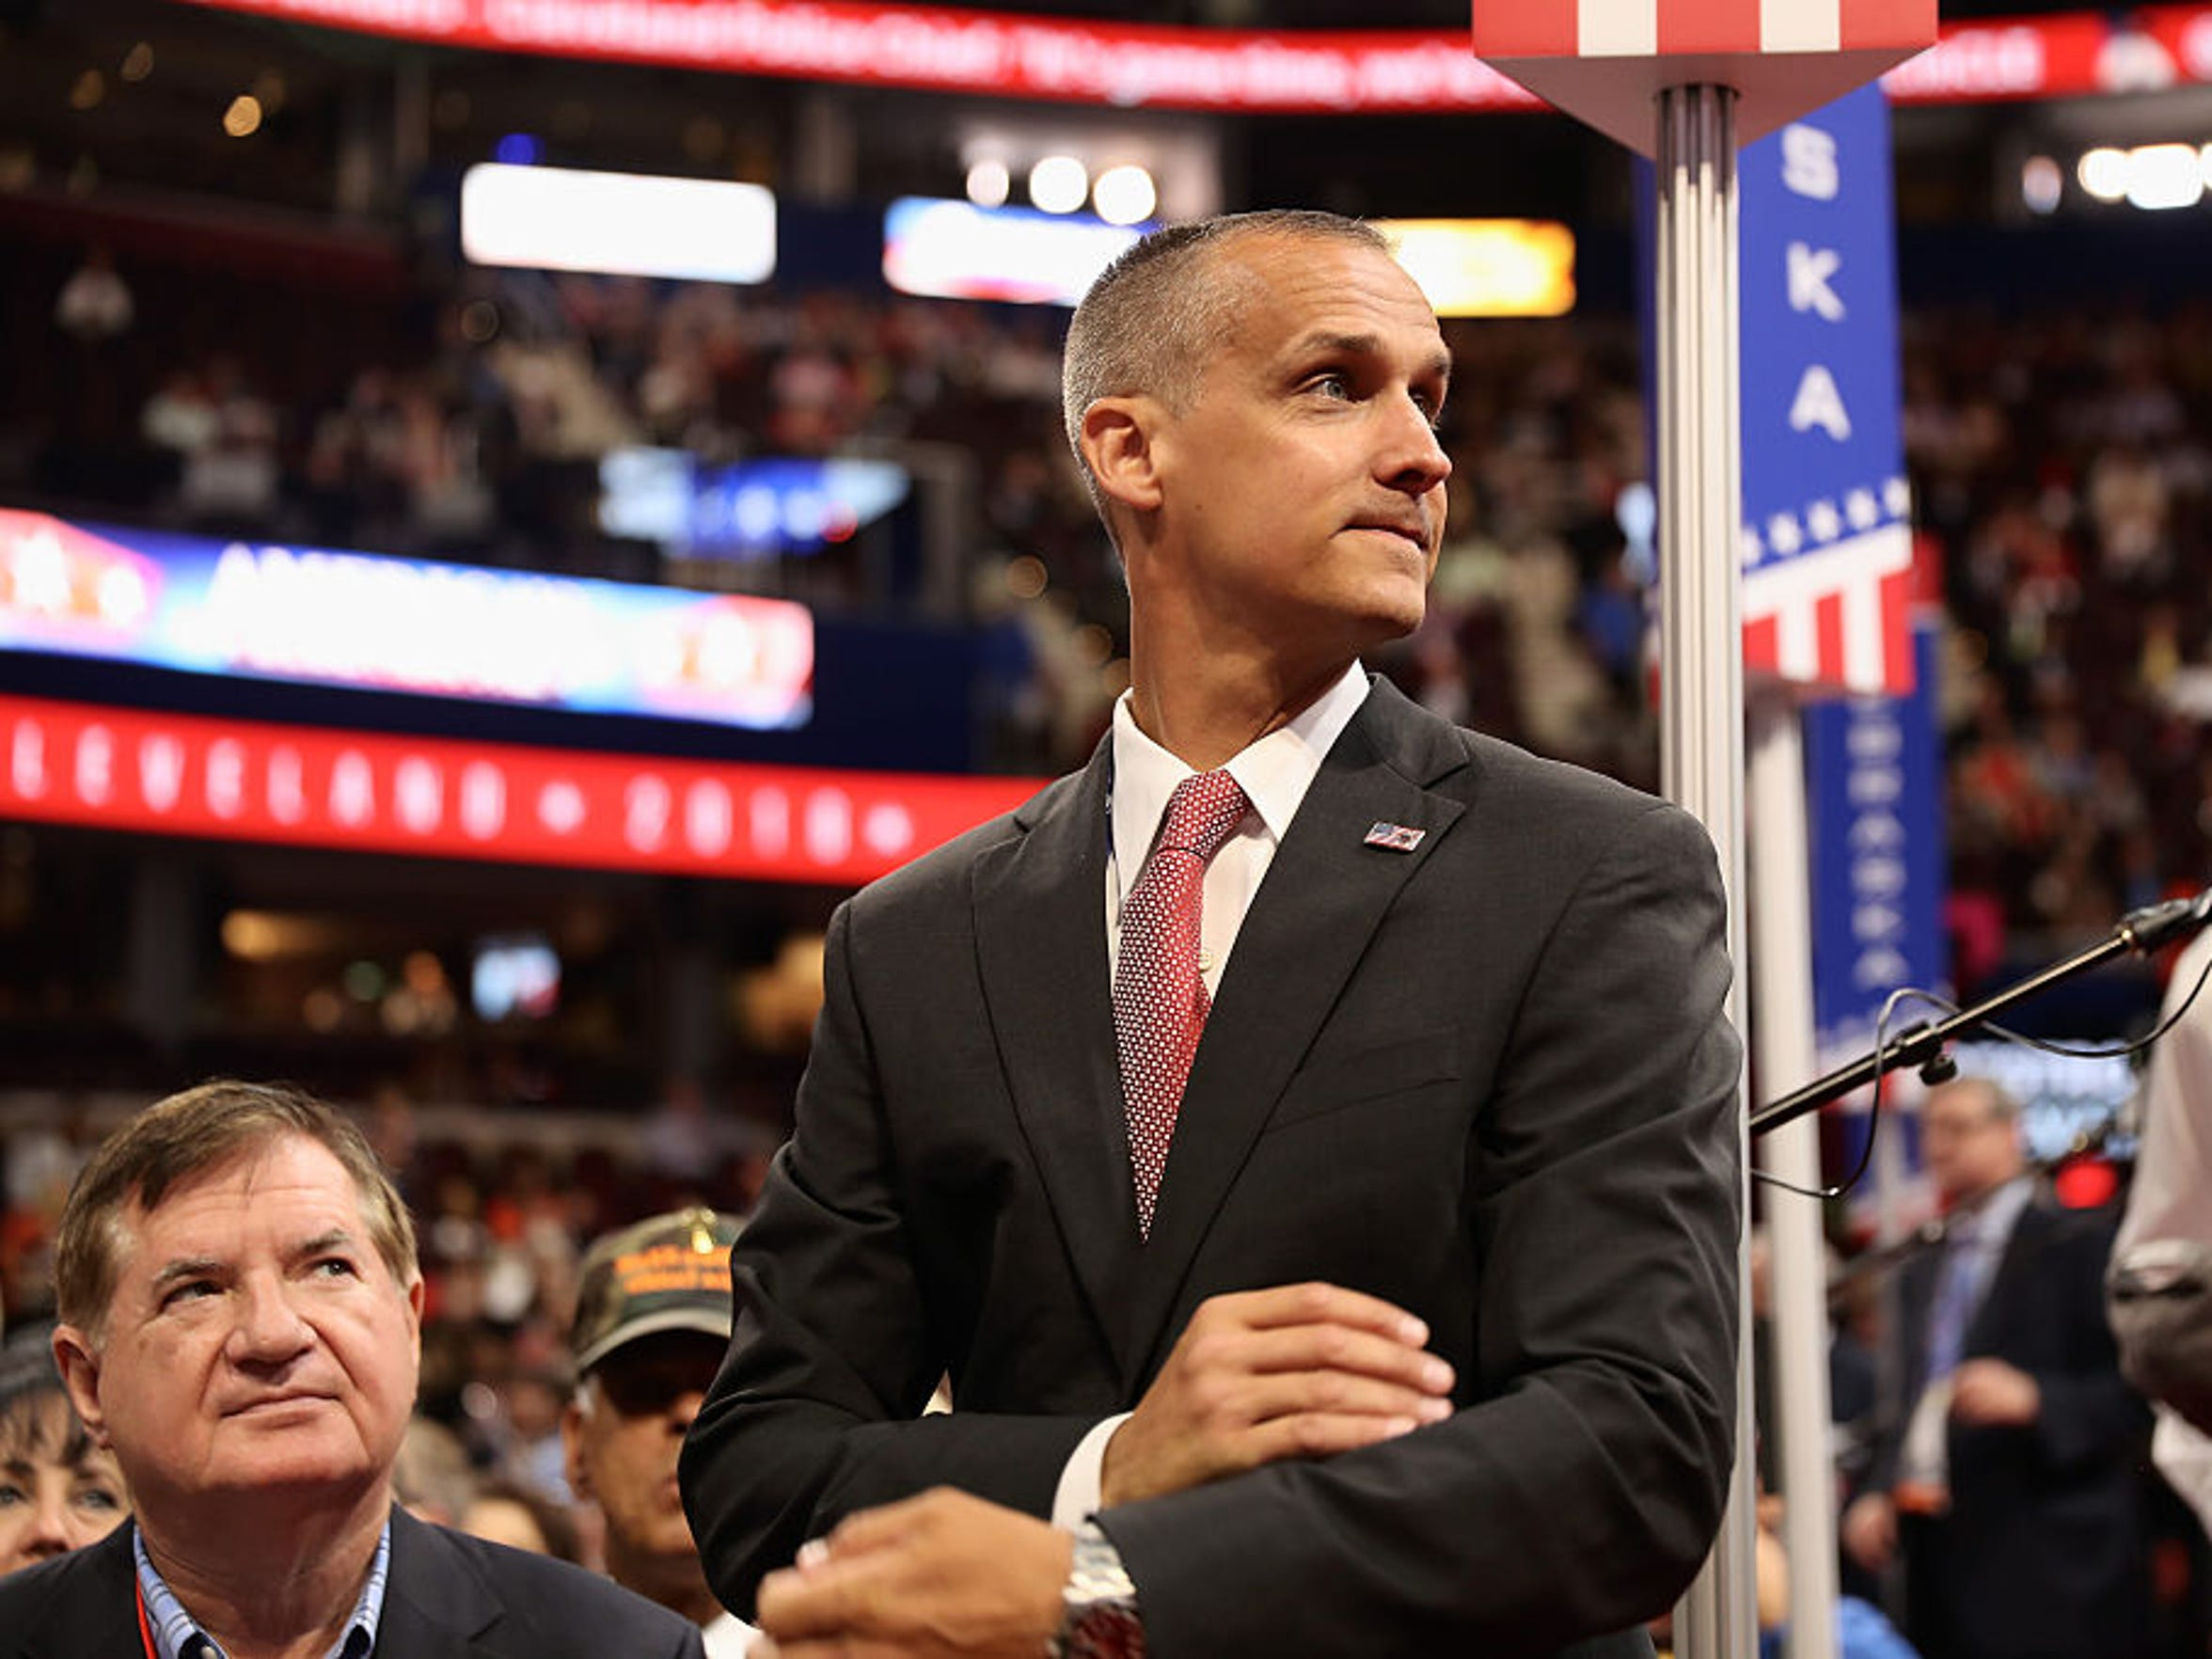 Corey Lewandowski, former campaign manager for Donald